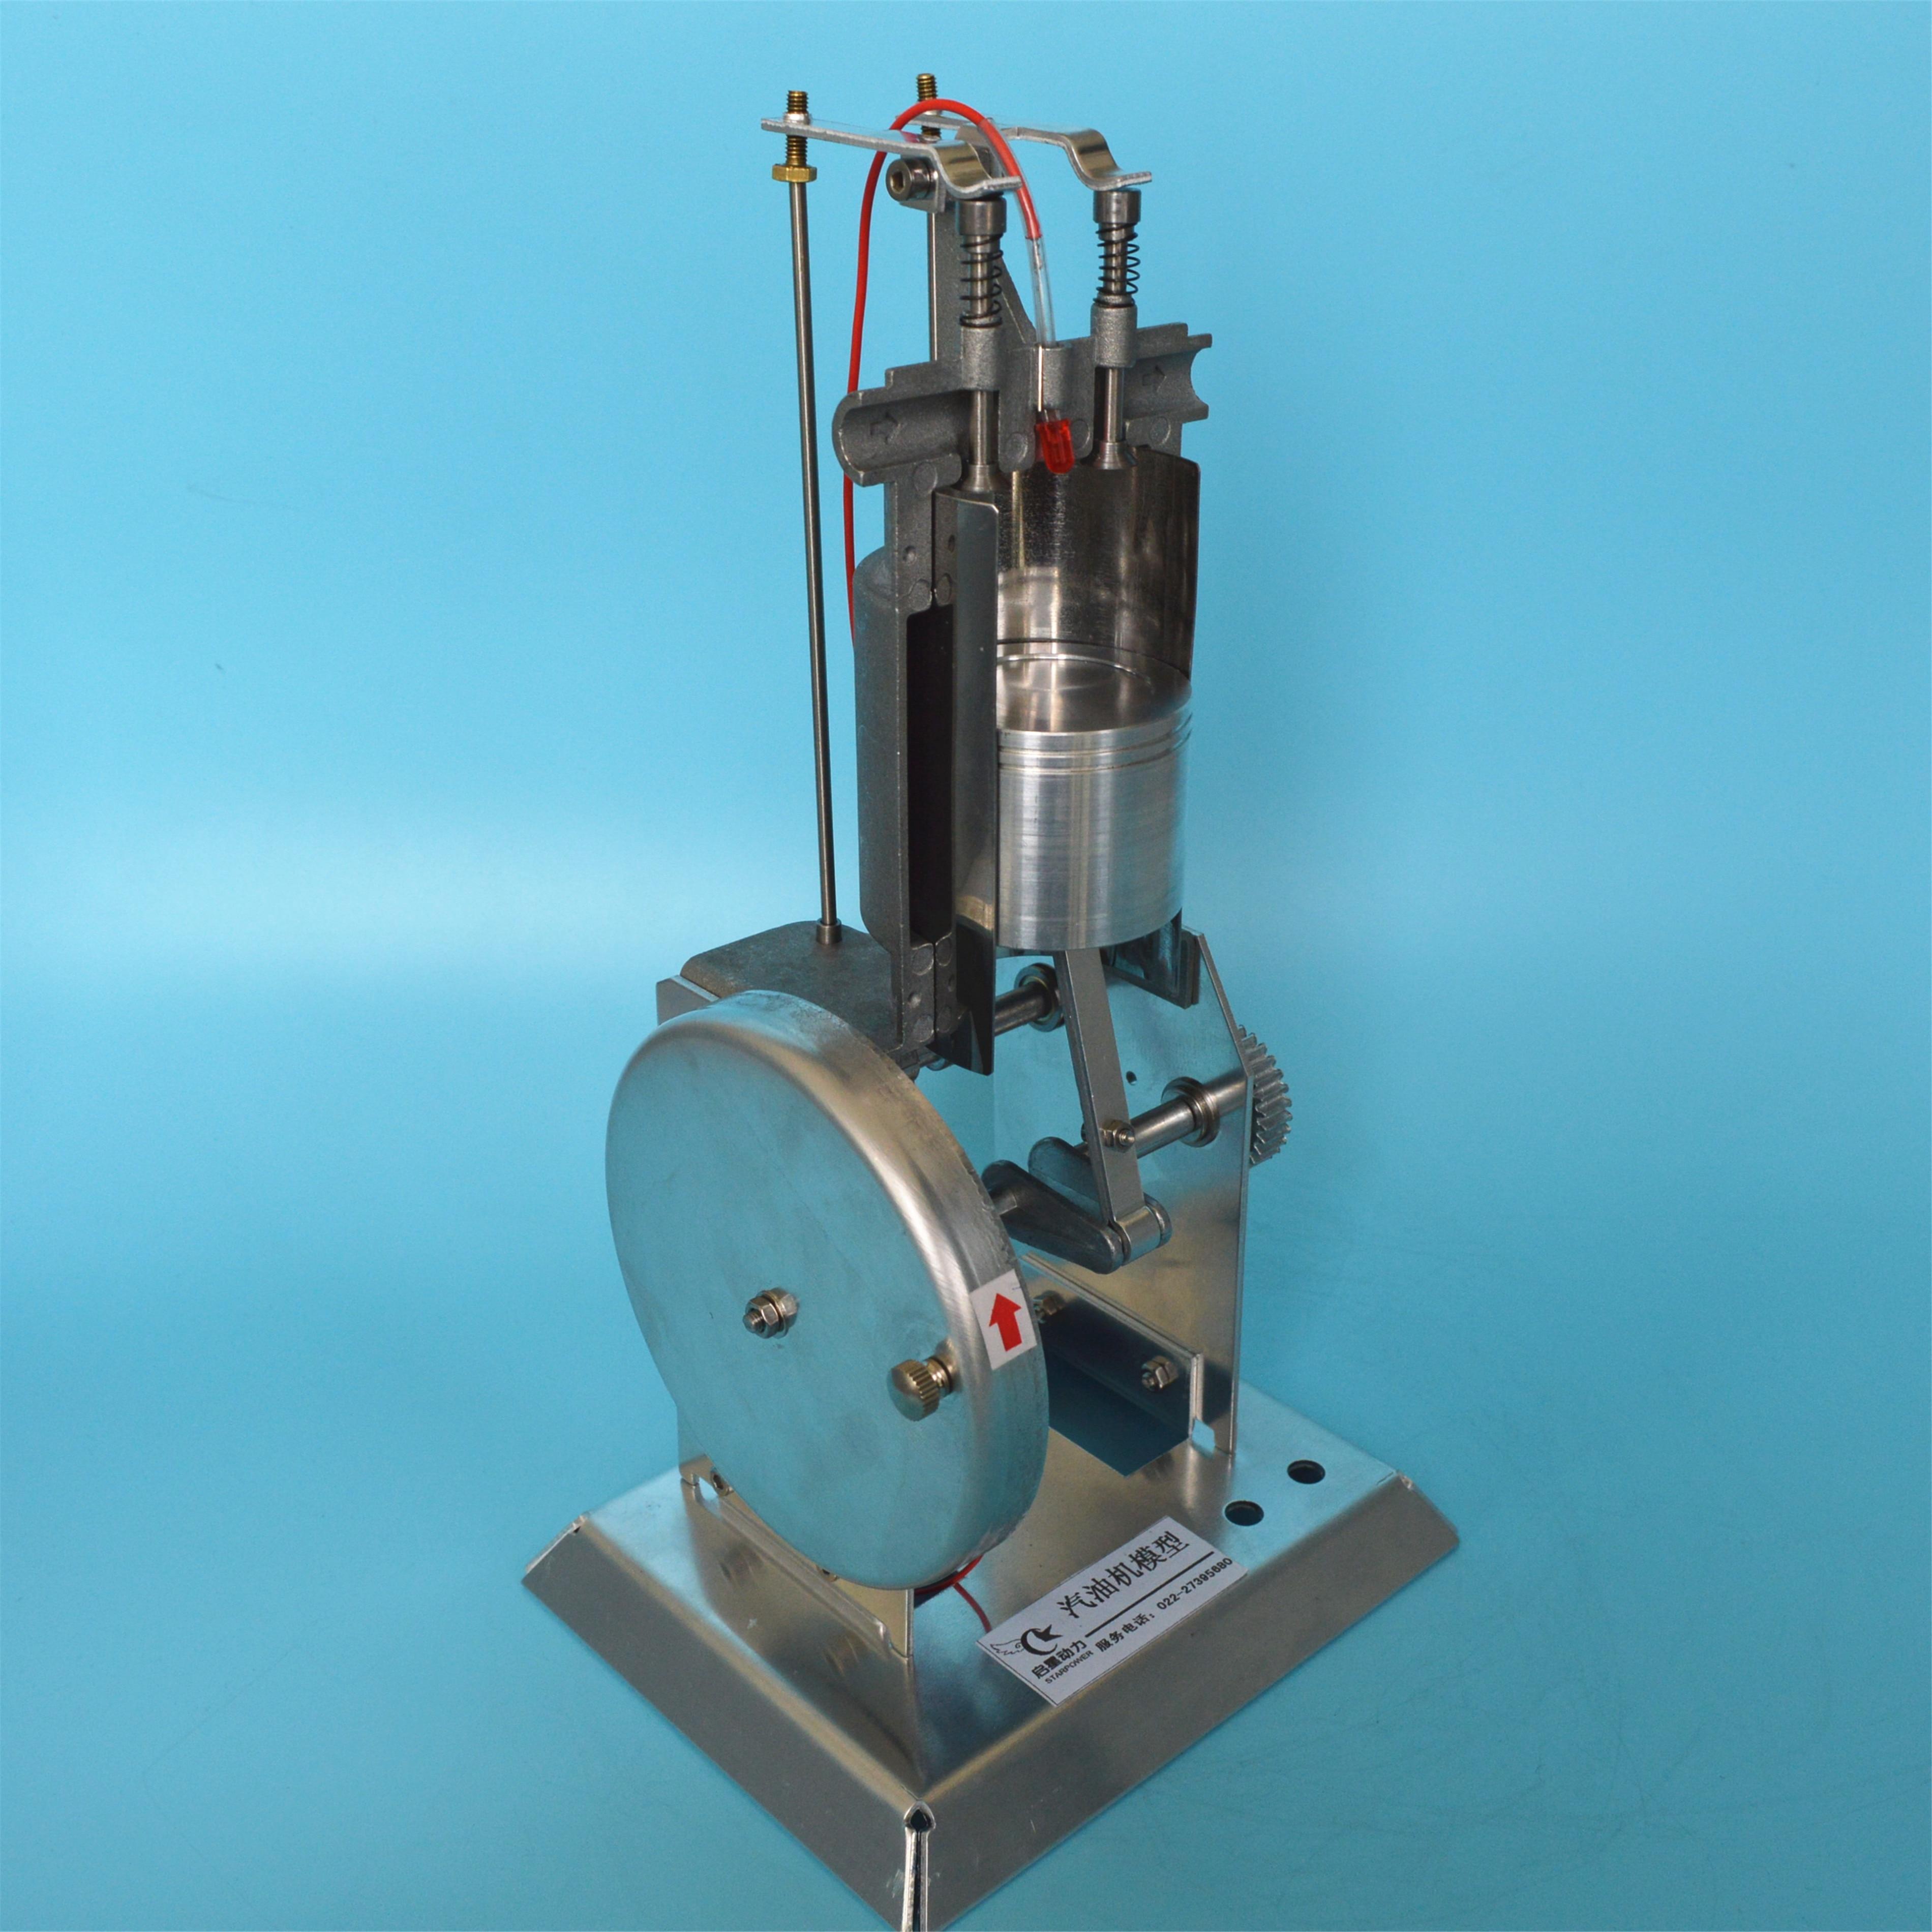 J31008 단일 실린더 내연 기관 4 행정 가솔린 금속 엔진 모델 물리학 실험 교육 장비-에서부품 & 액세서리부터 완구 & 취미 의  그룹 1